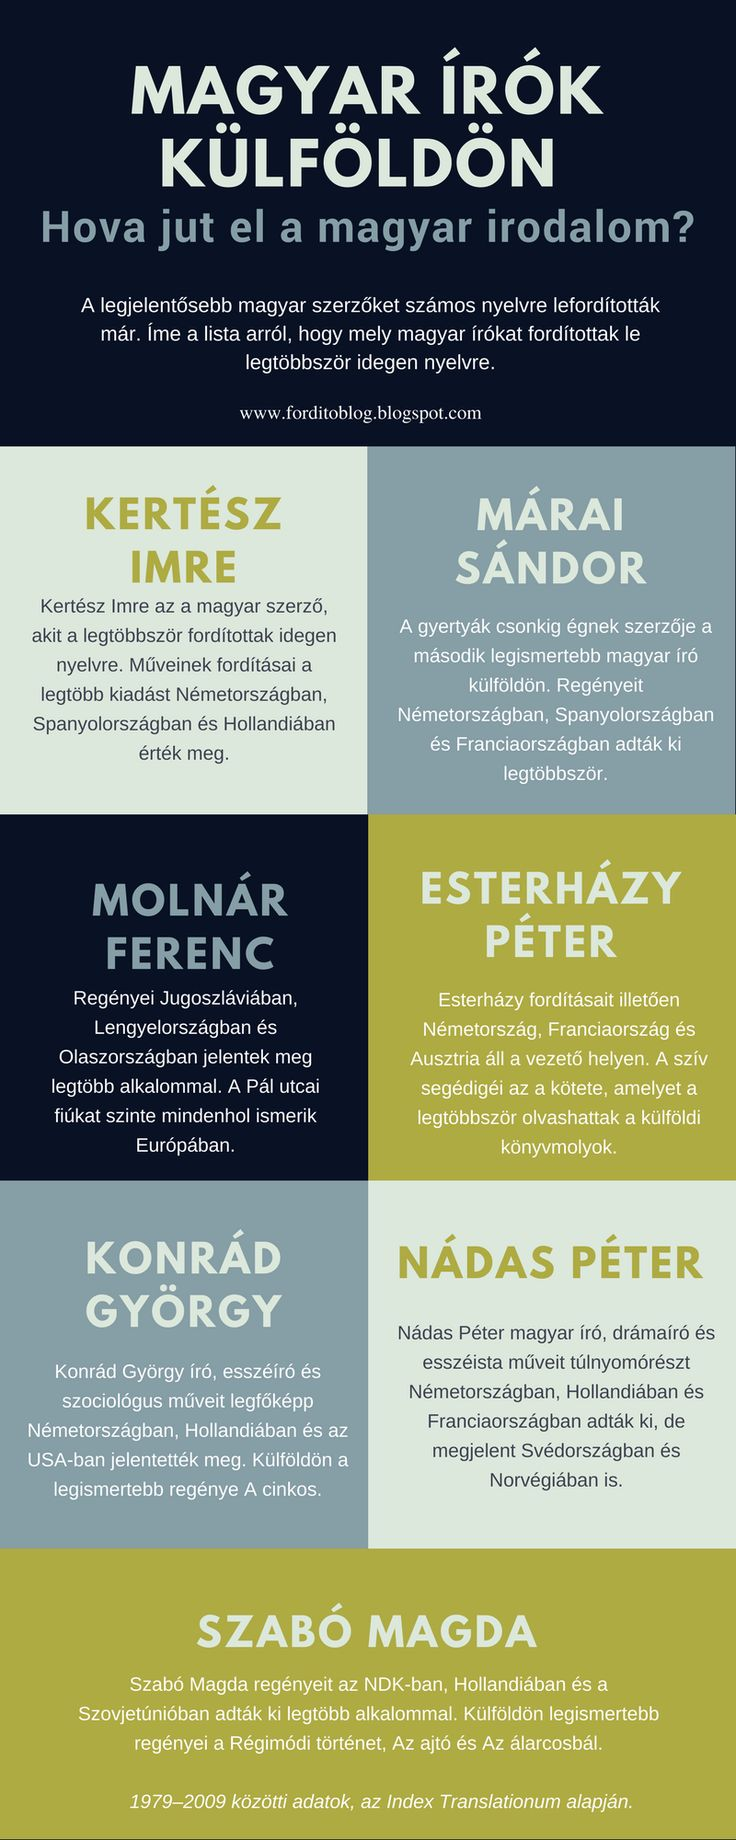 Magyar írók külföldön. Hova jut el a magyar irodalom?